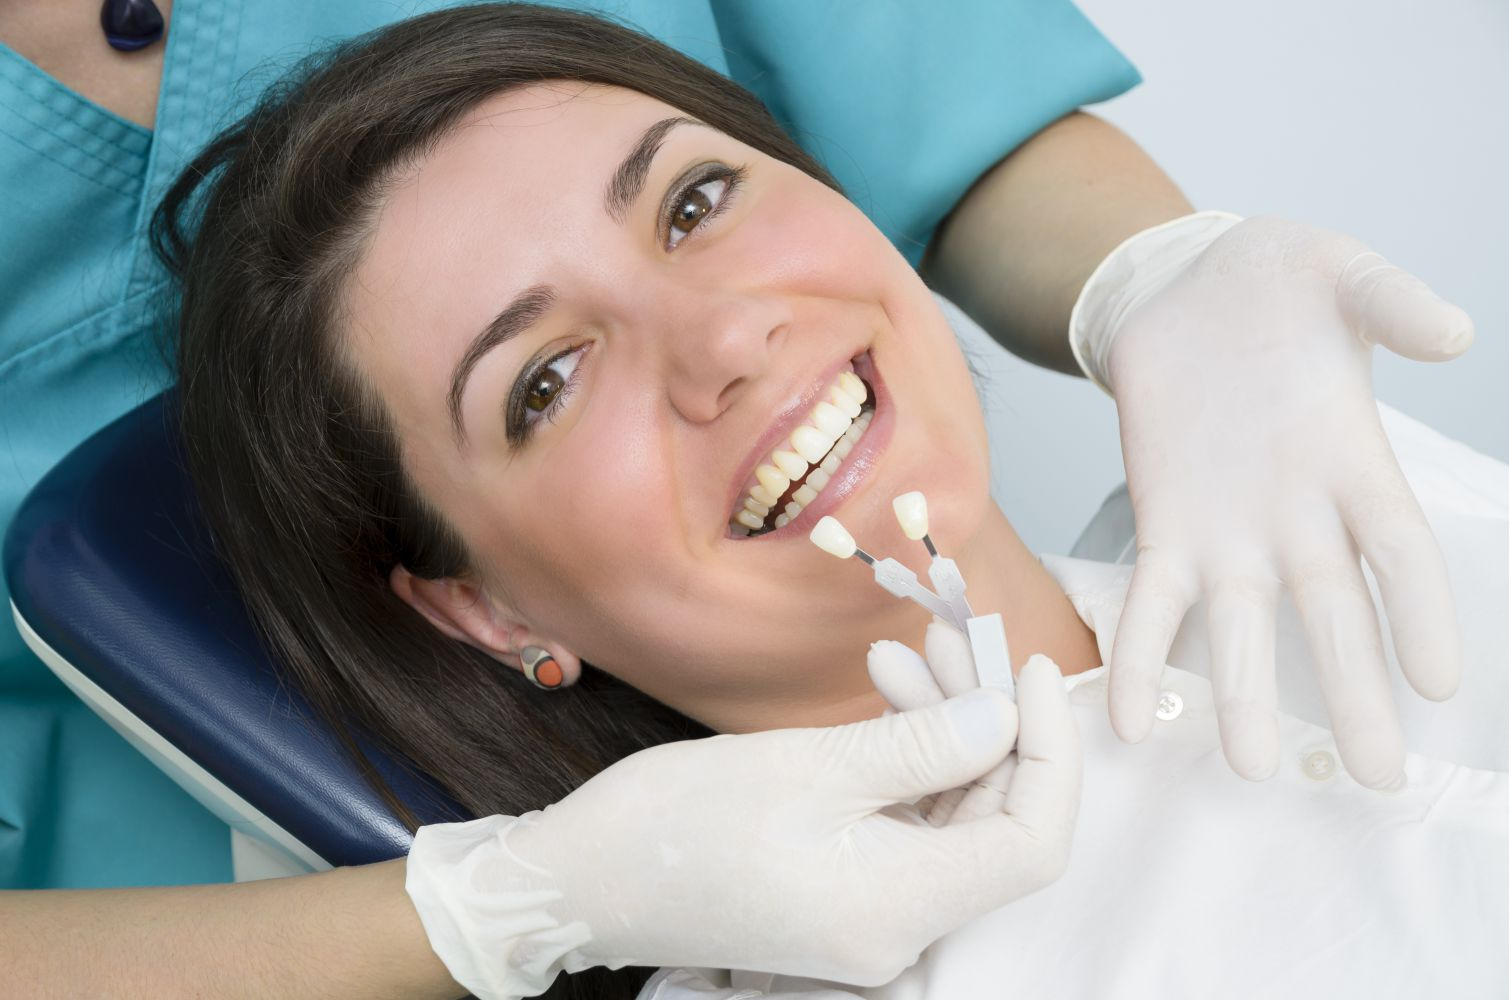 Happy young woman getting porcelain veneers